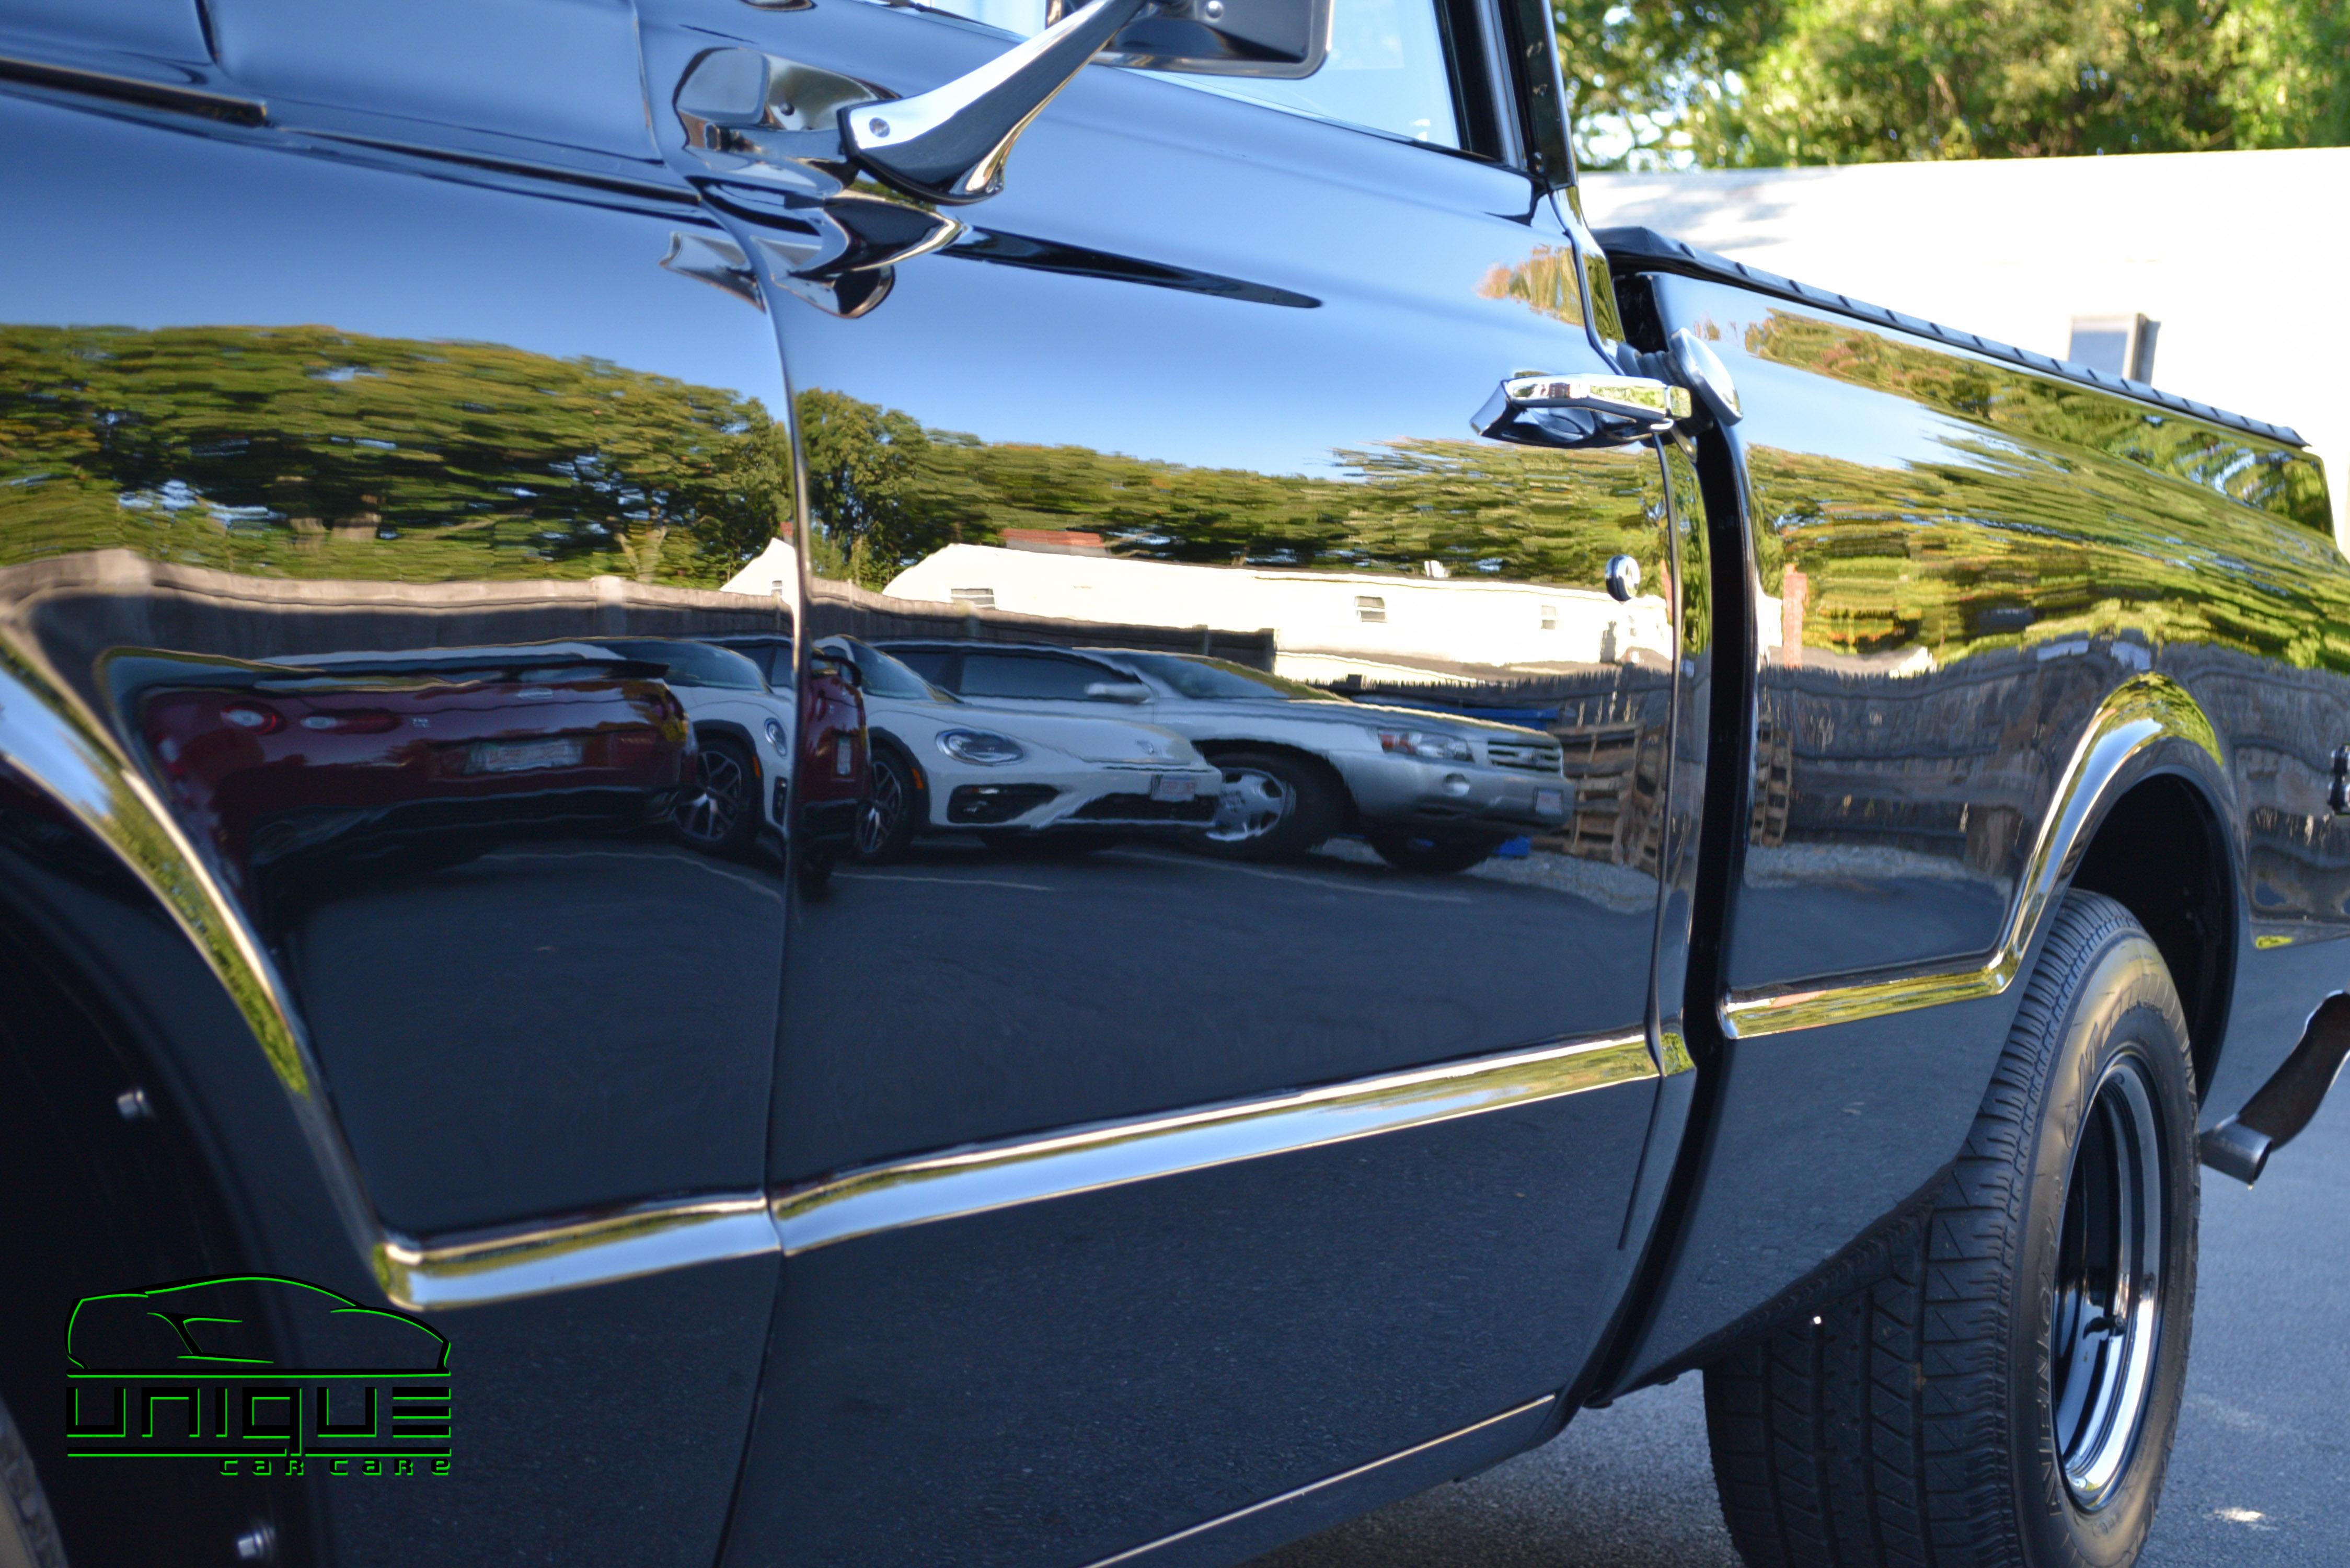 UCC_Custom 72' Chevy Pick up-69